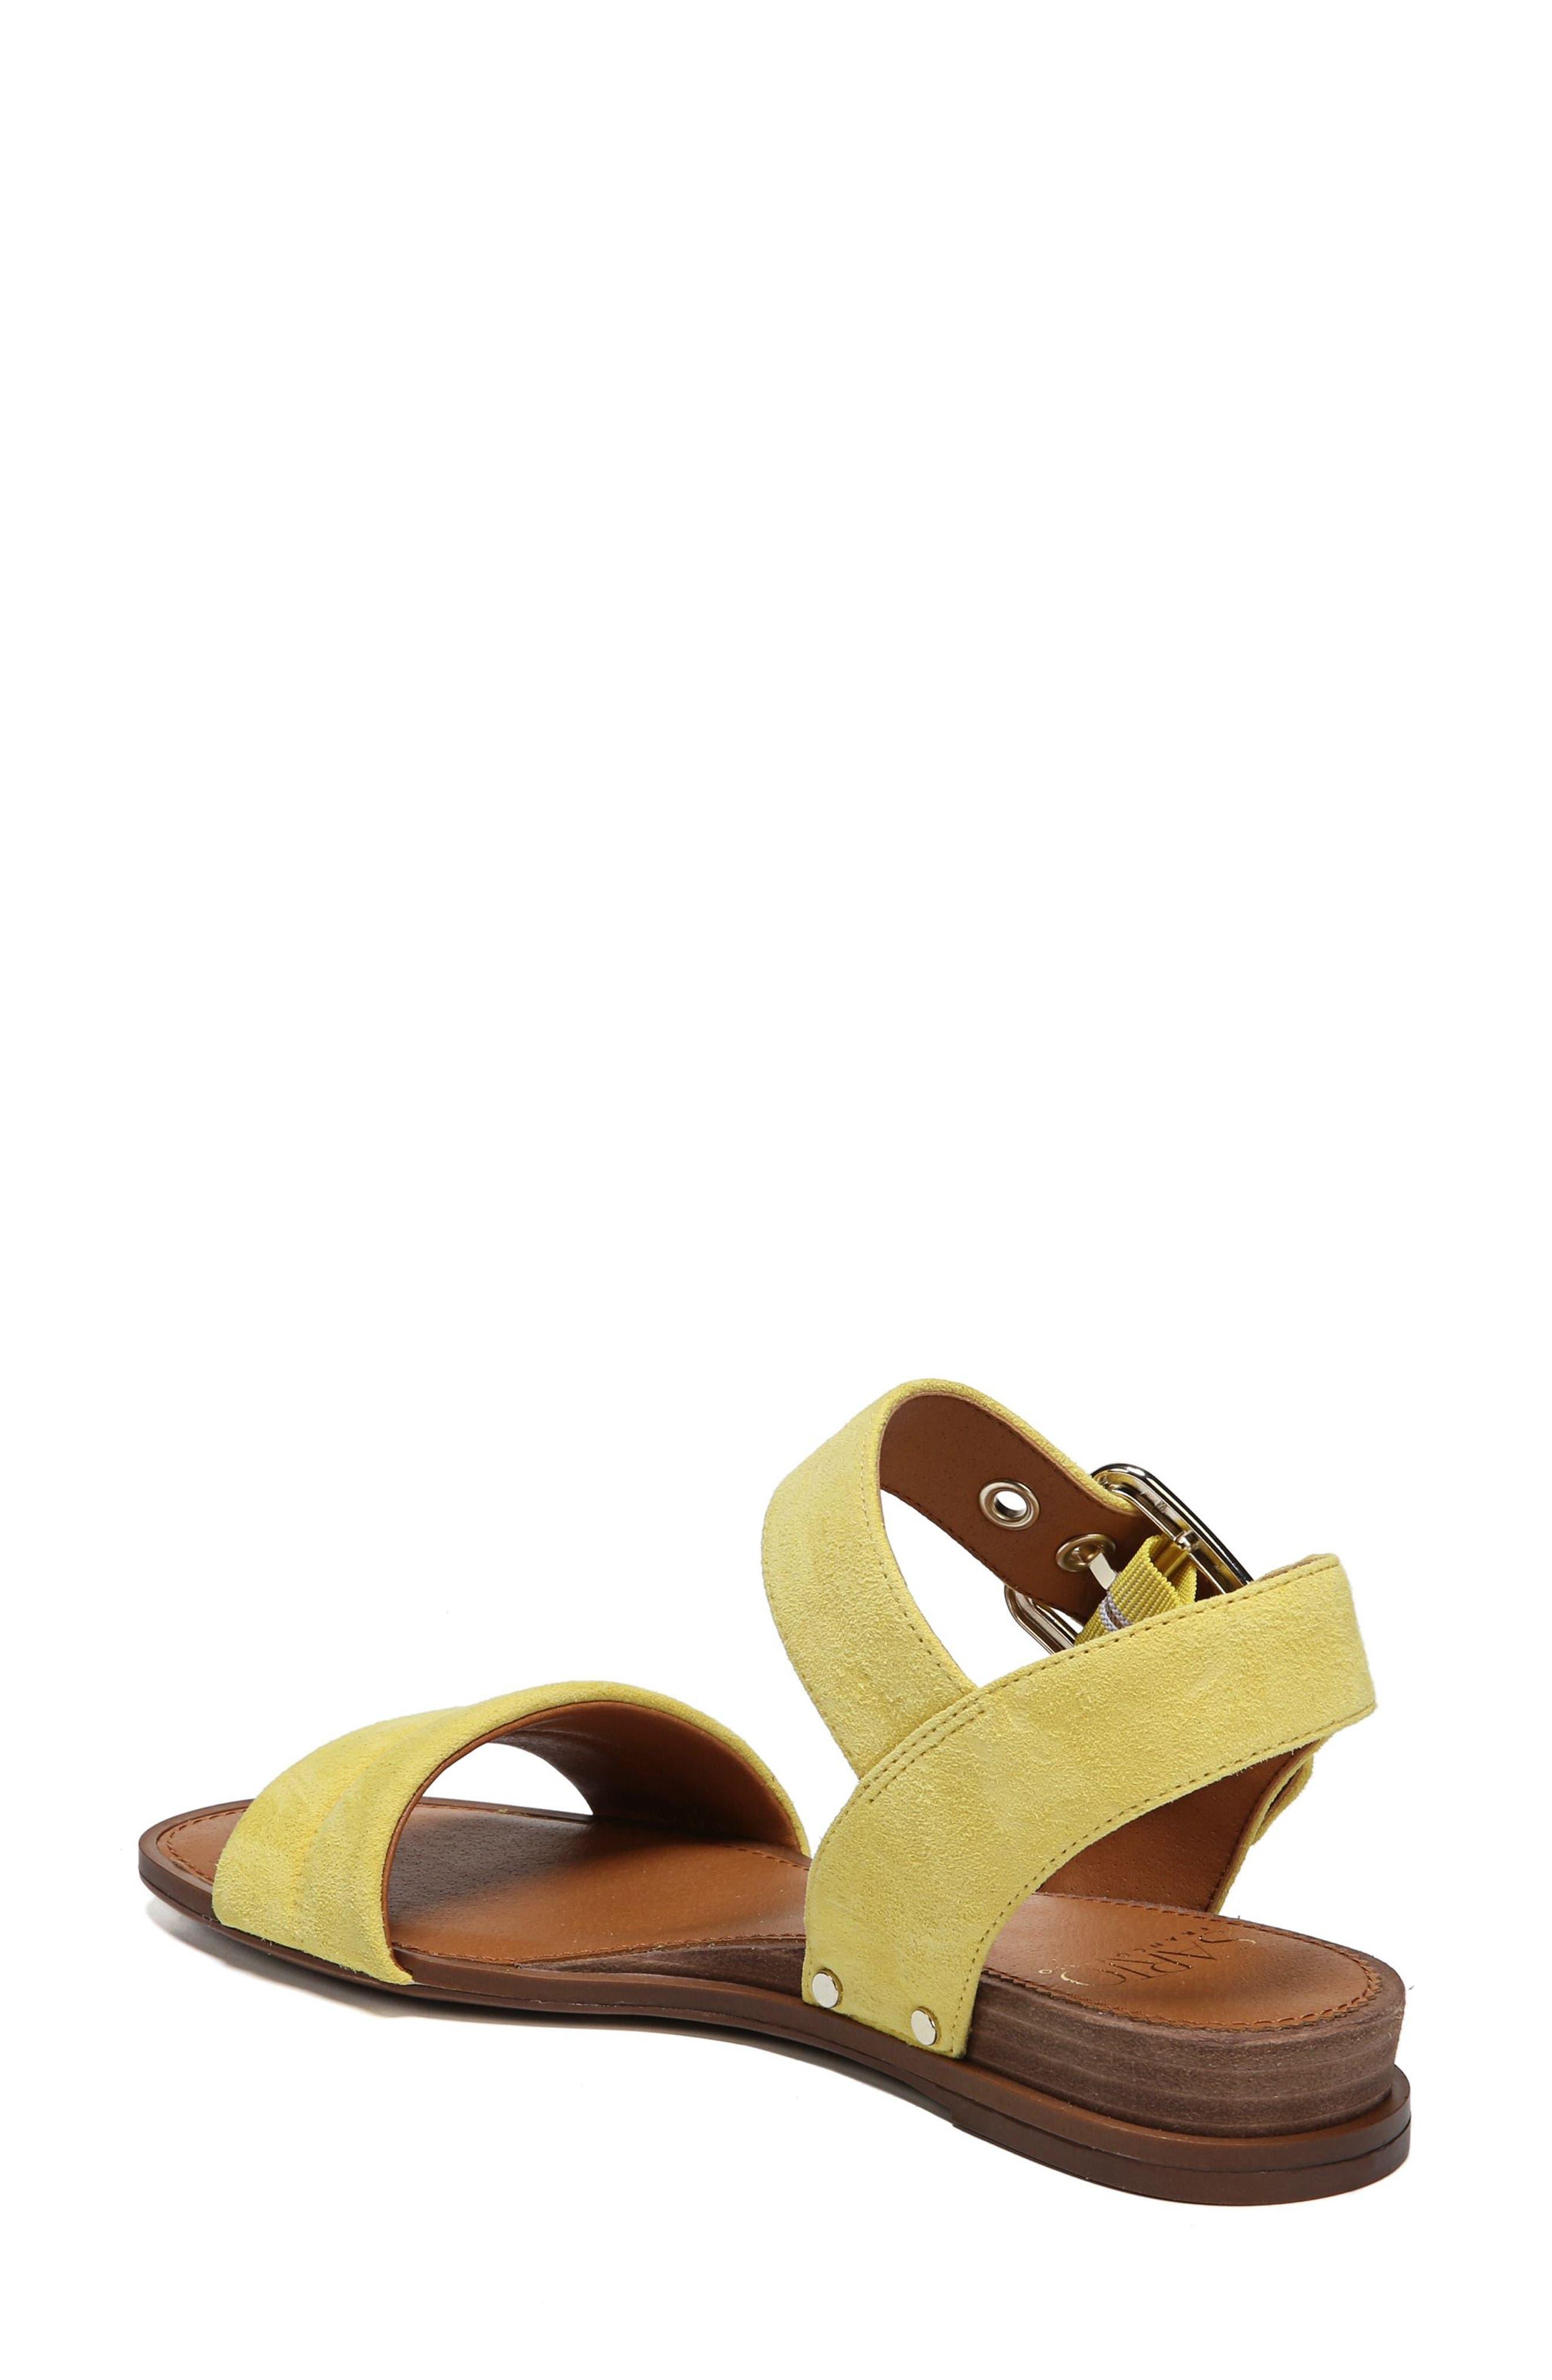 Patterson Low Wedge Sandal,                             Alternate thumbnail 12, color,